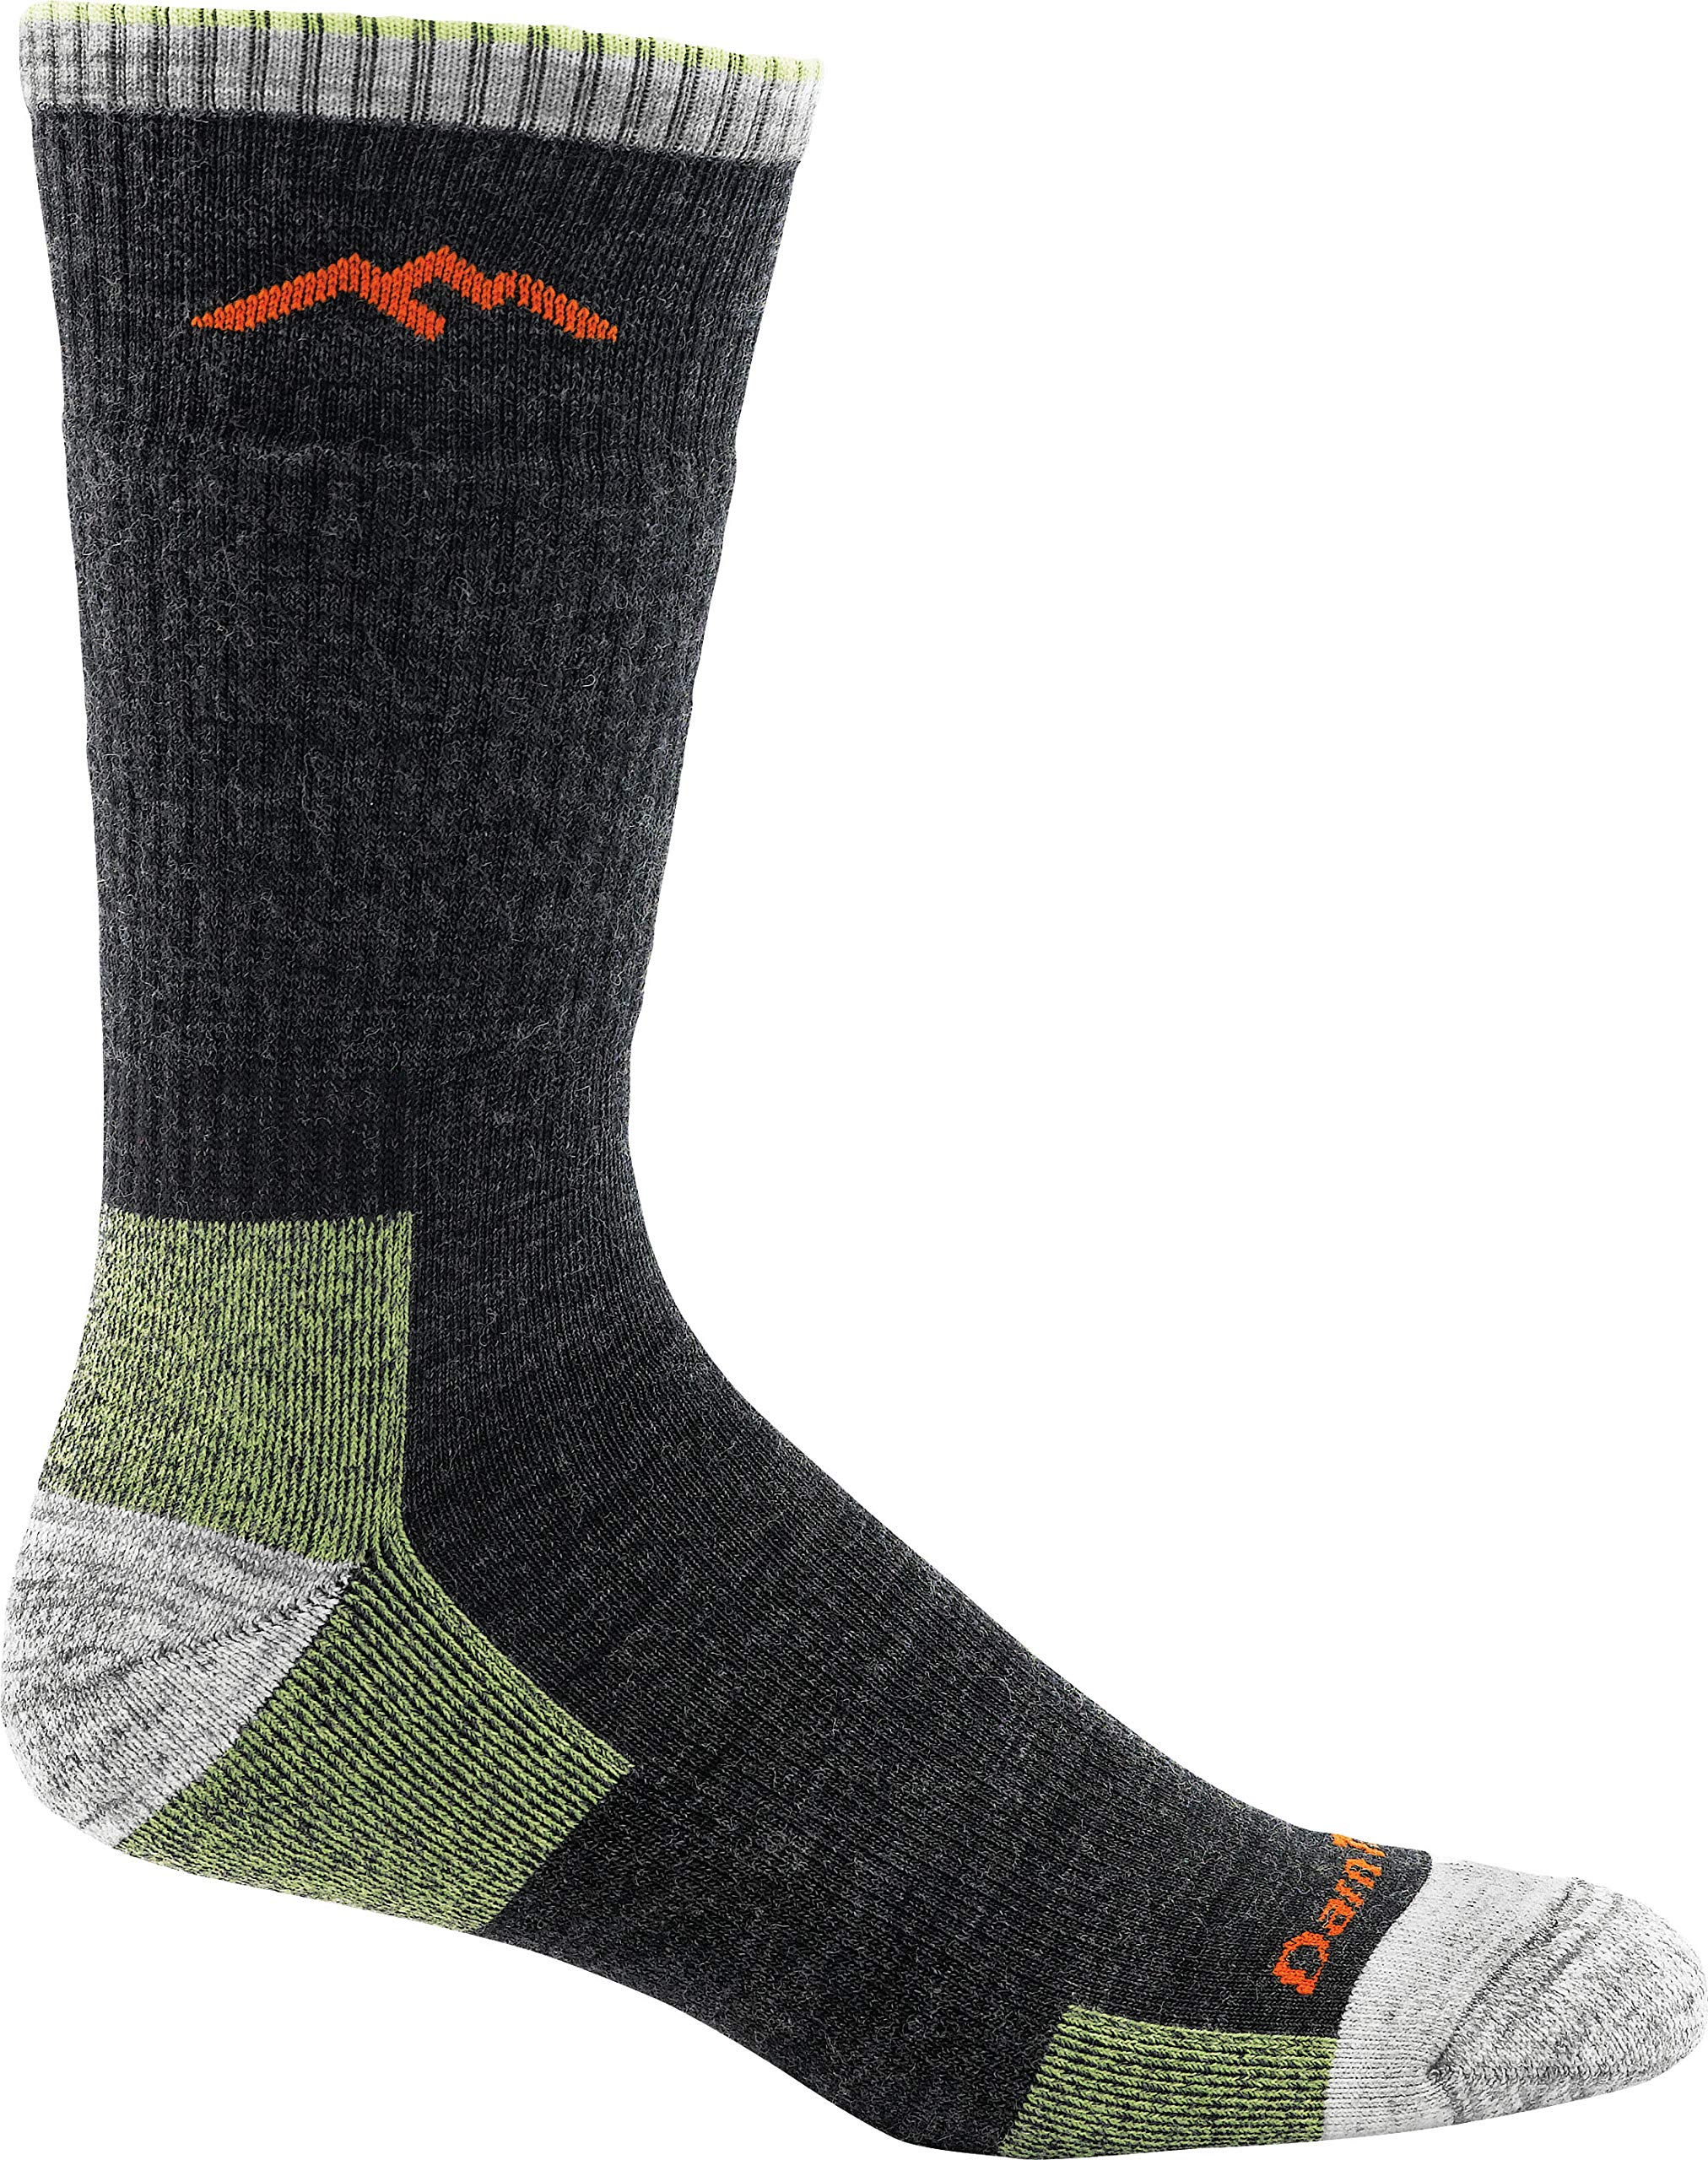 Darn Tough Merino Wool Hike/Trek Boot Socks - Men's Lime 2X-Large by Darn Tough